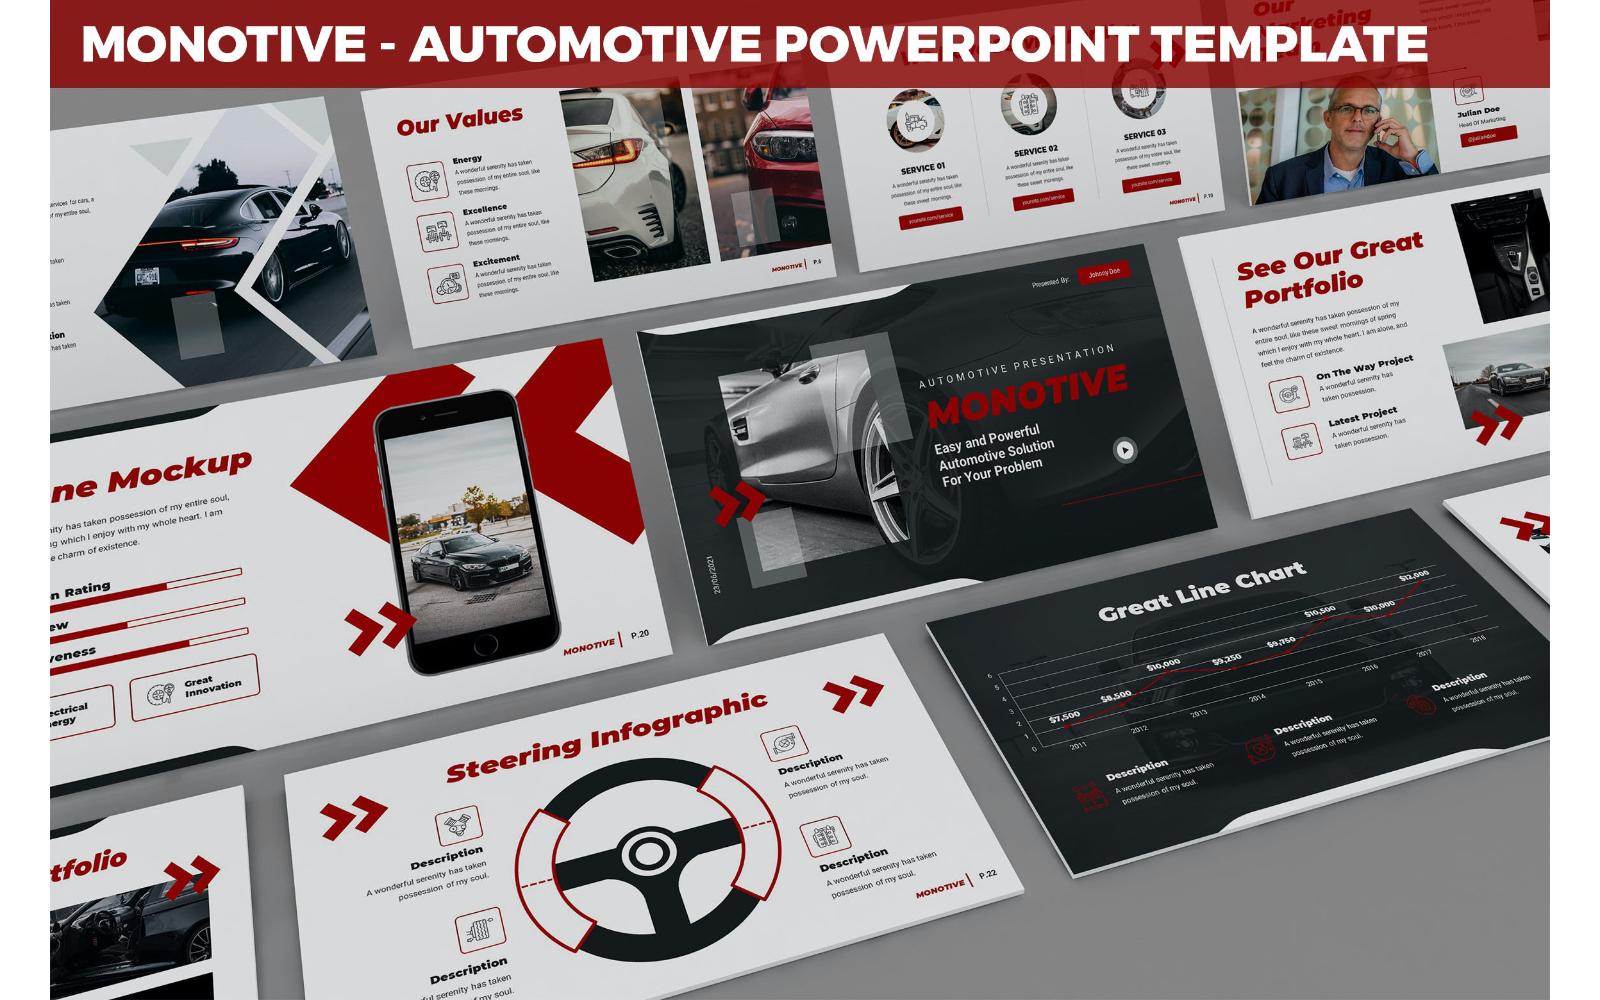 Monotive - Automotive Powerpoint Template